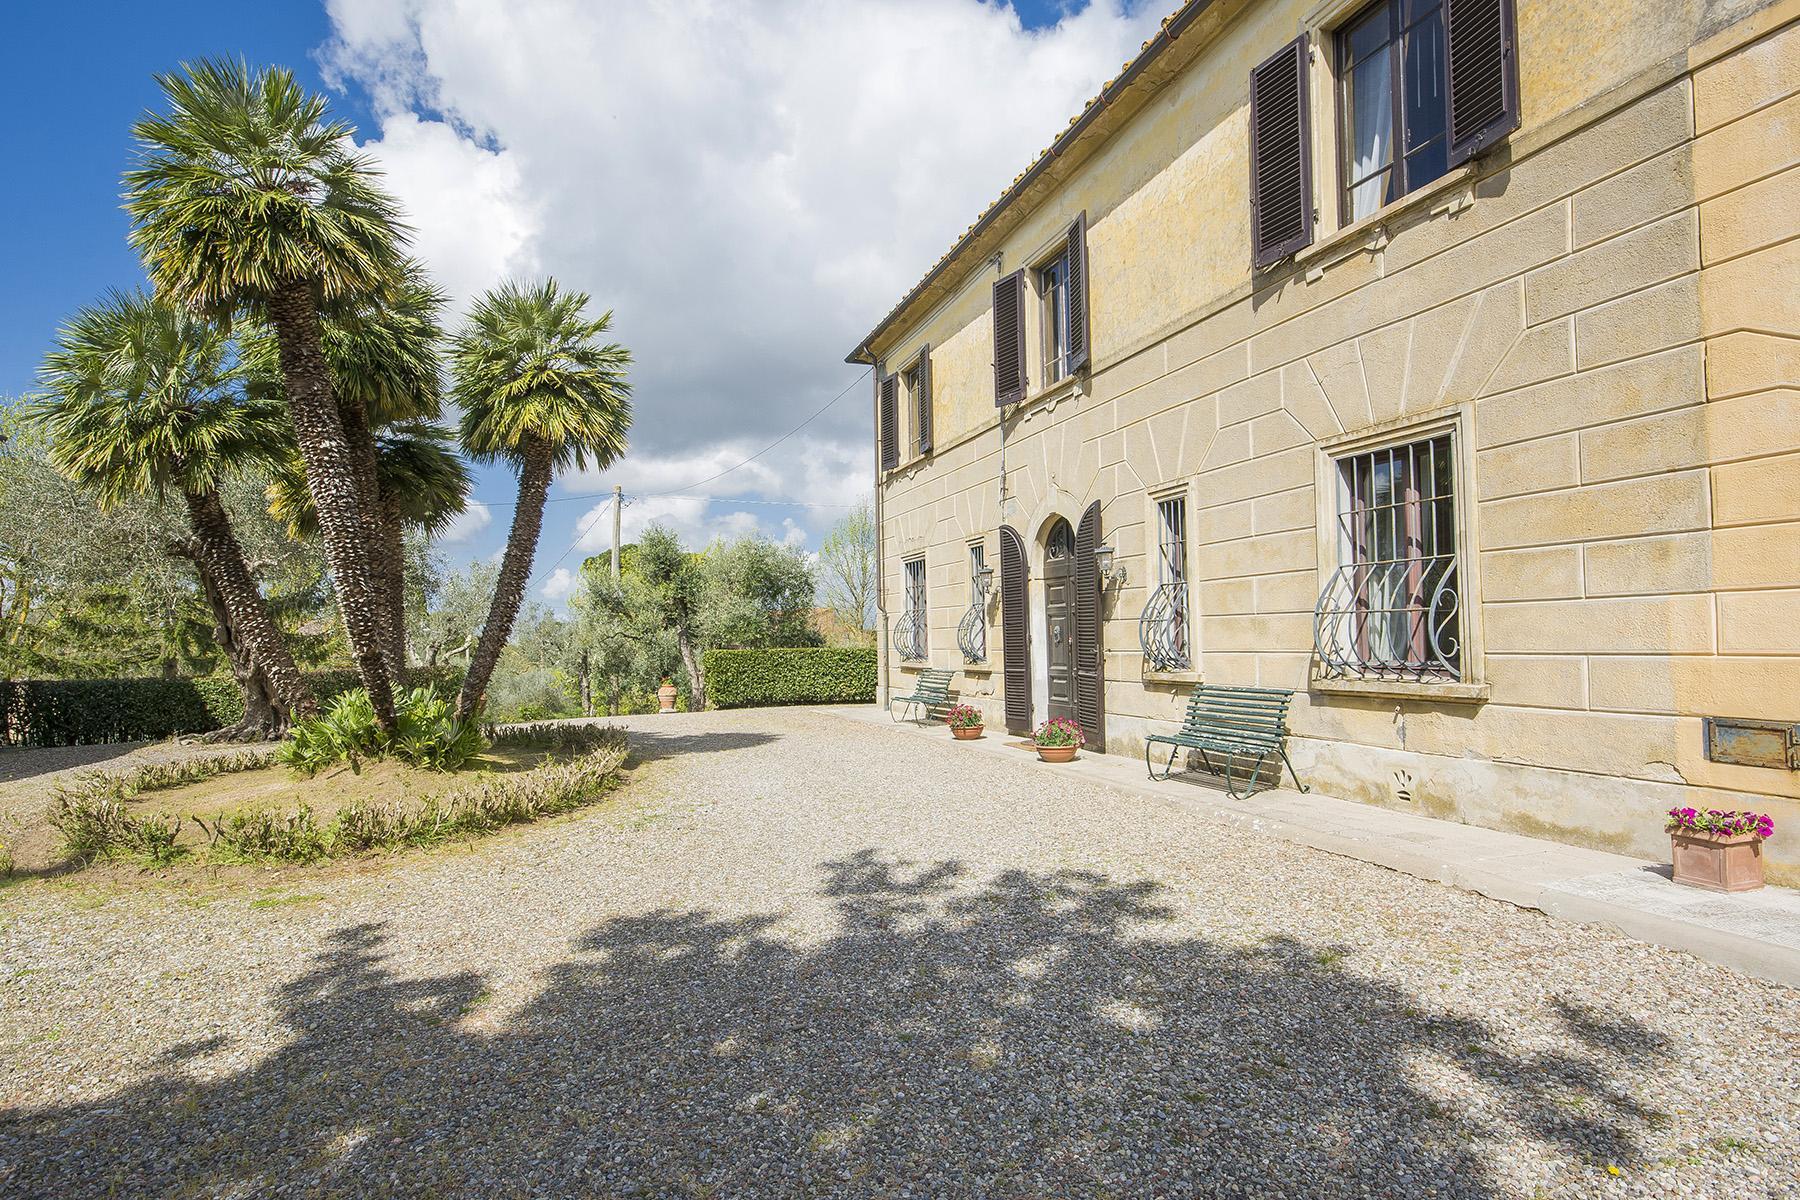 Elégante villa sur les collines toscanes - 24